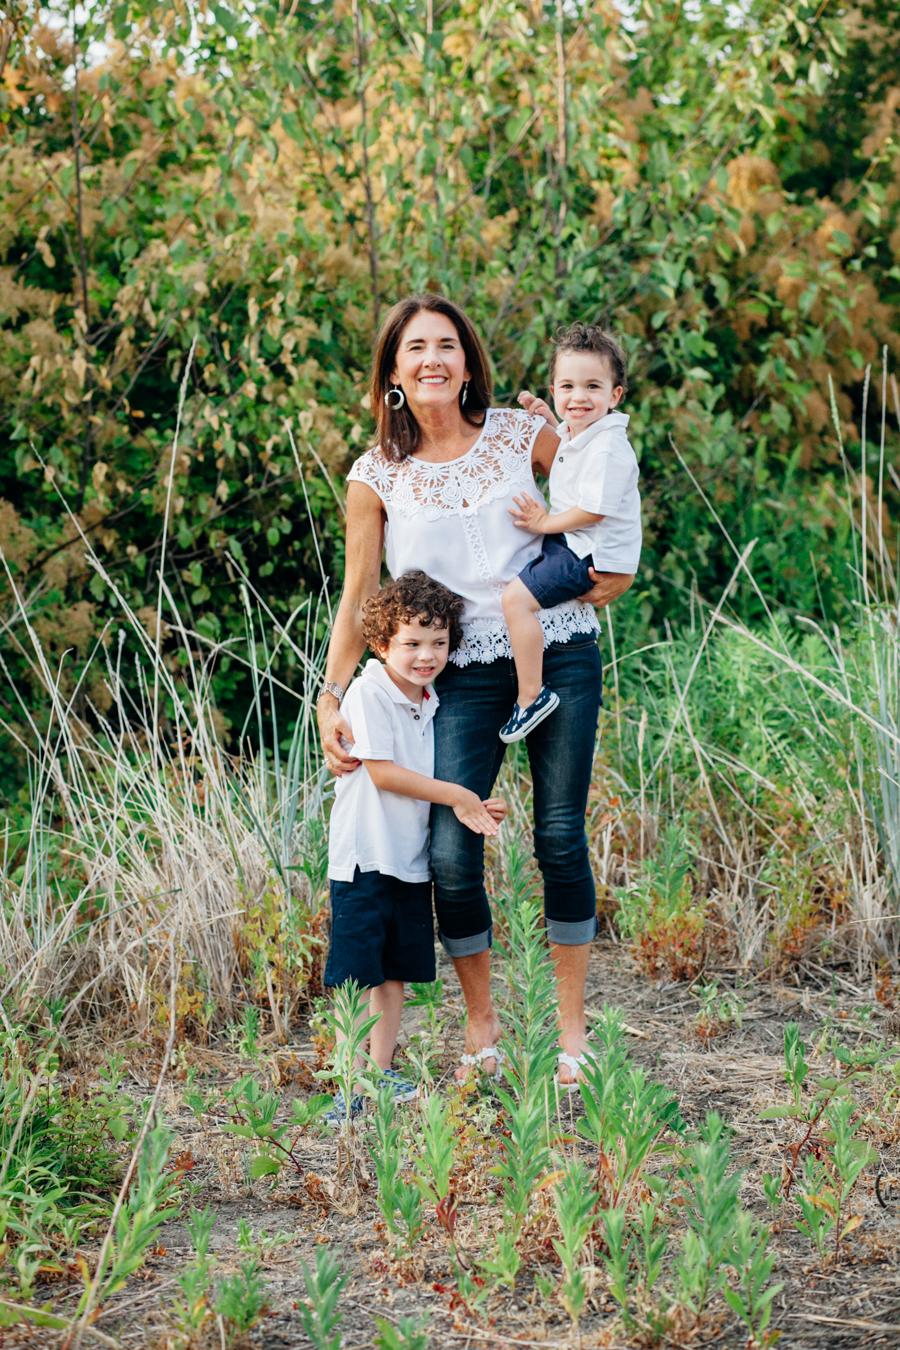 007-semiahmoo-family-session-katheryn-moran-photography.jpg